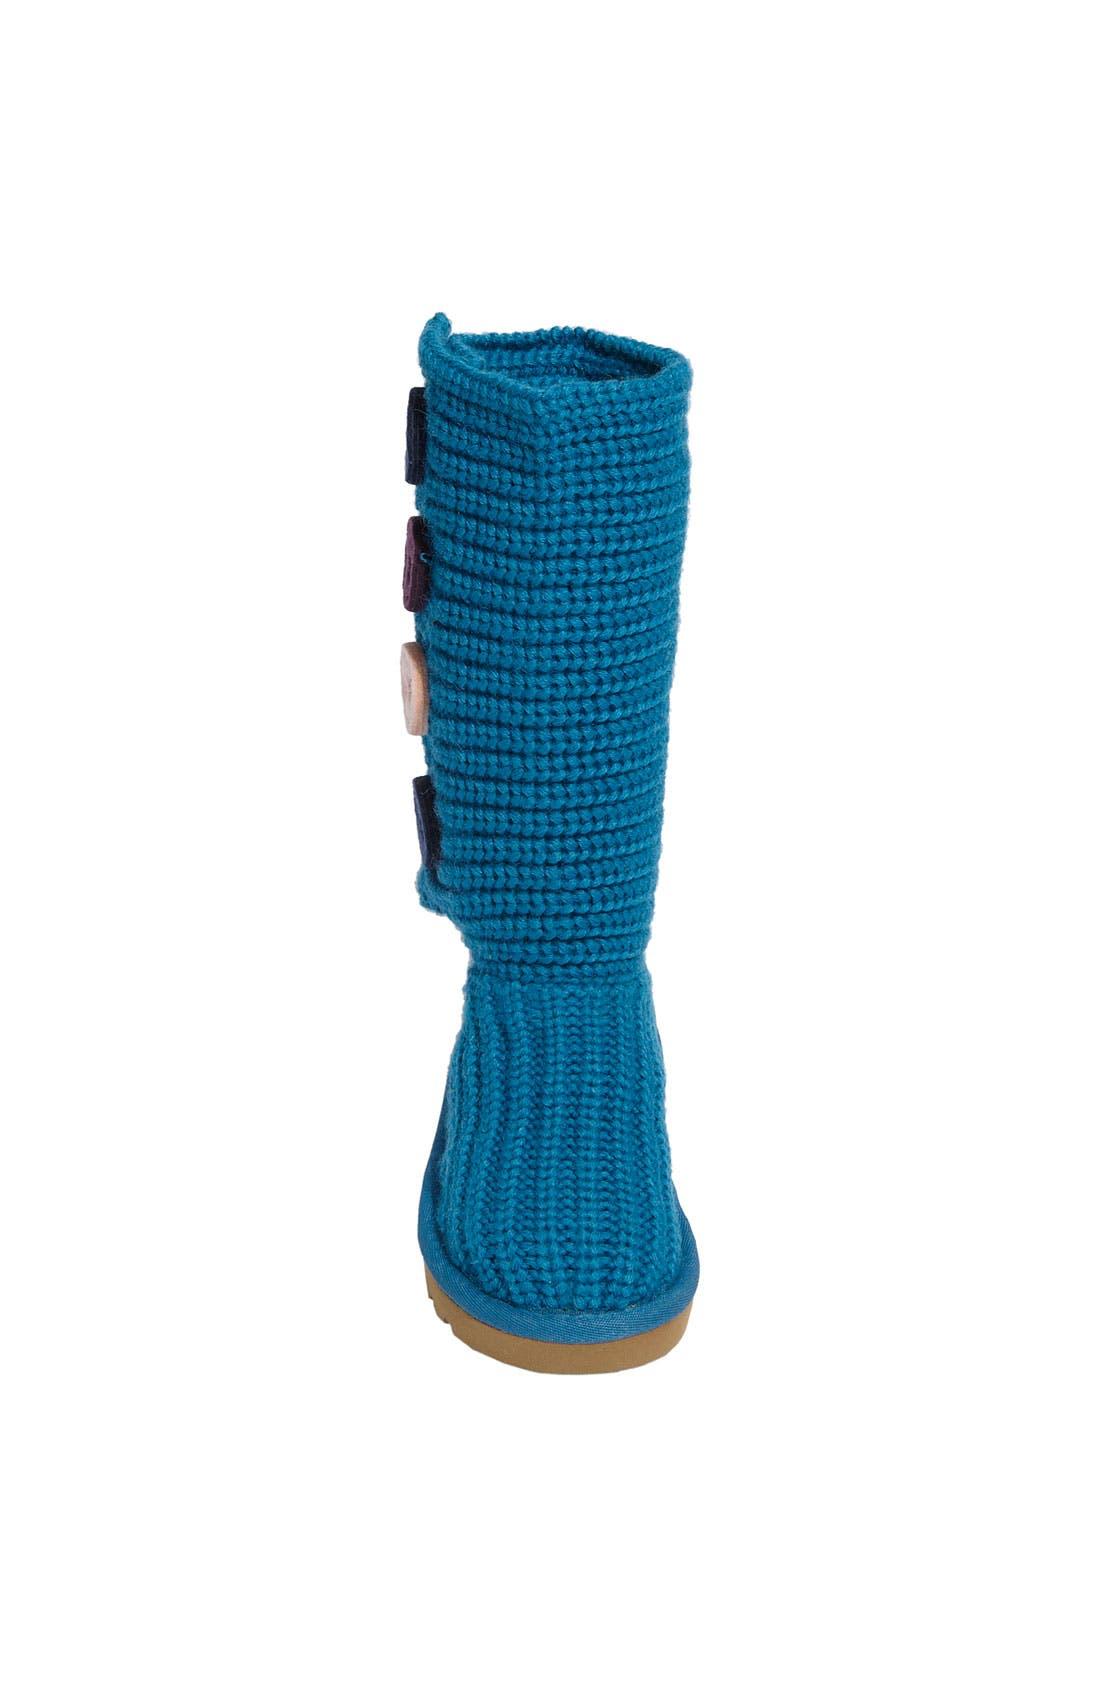 Alternate Image 3  - UGG® Australia 'Cardy II' Crochet Boot (Toddler, Little Kid & Big Kid)